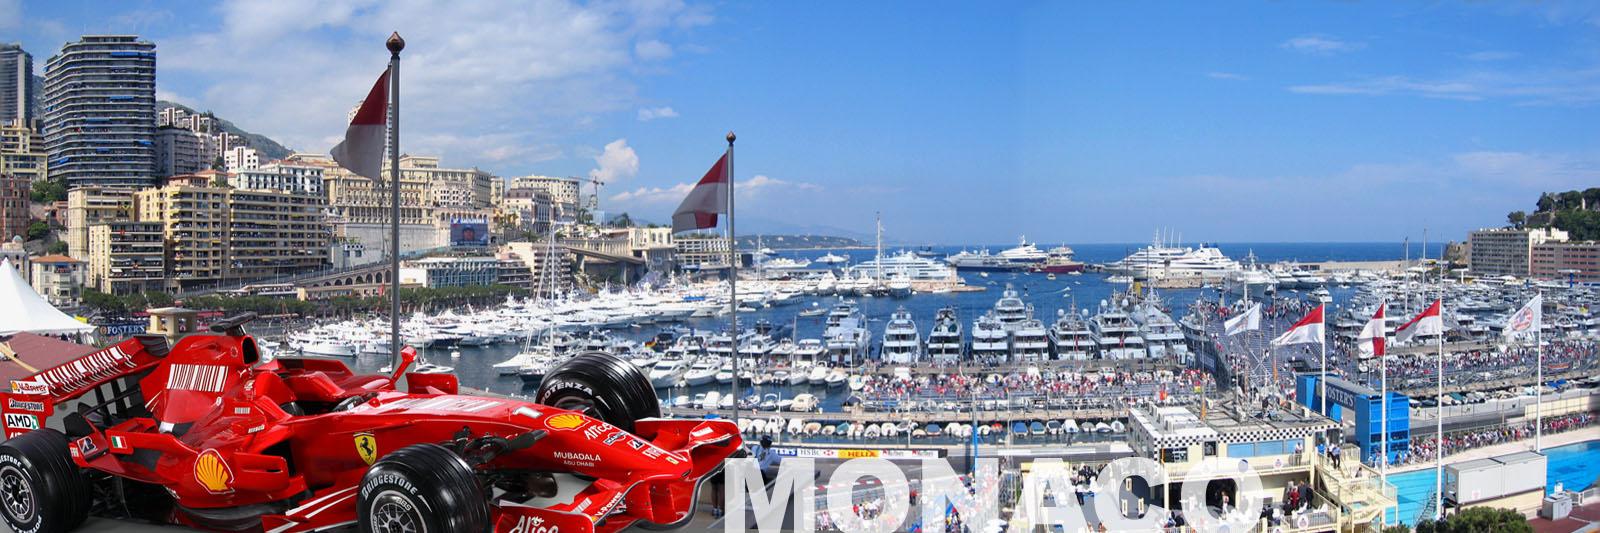 Monaco Harbour during Formula One Grand Prix